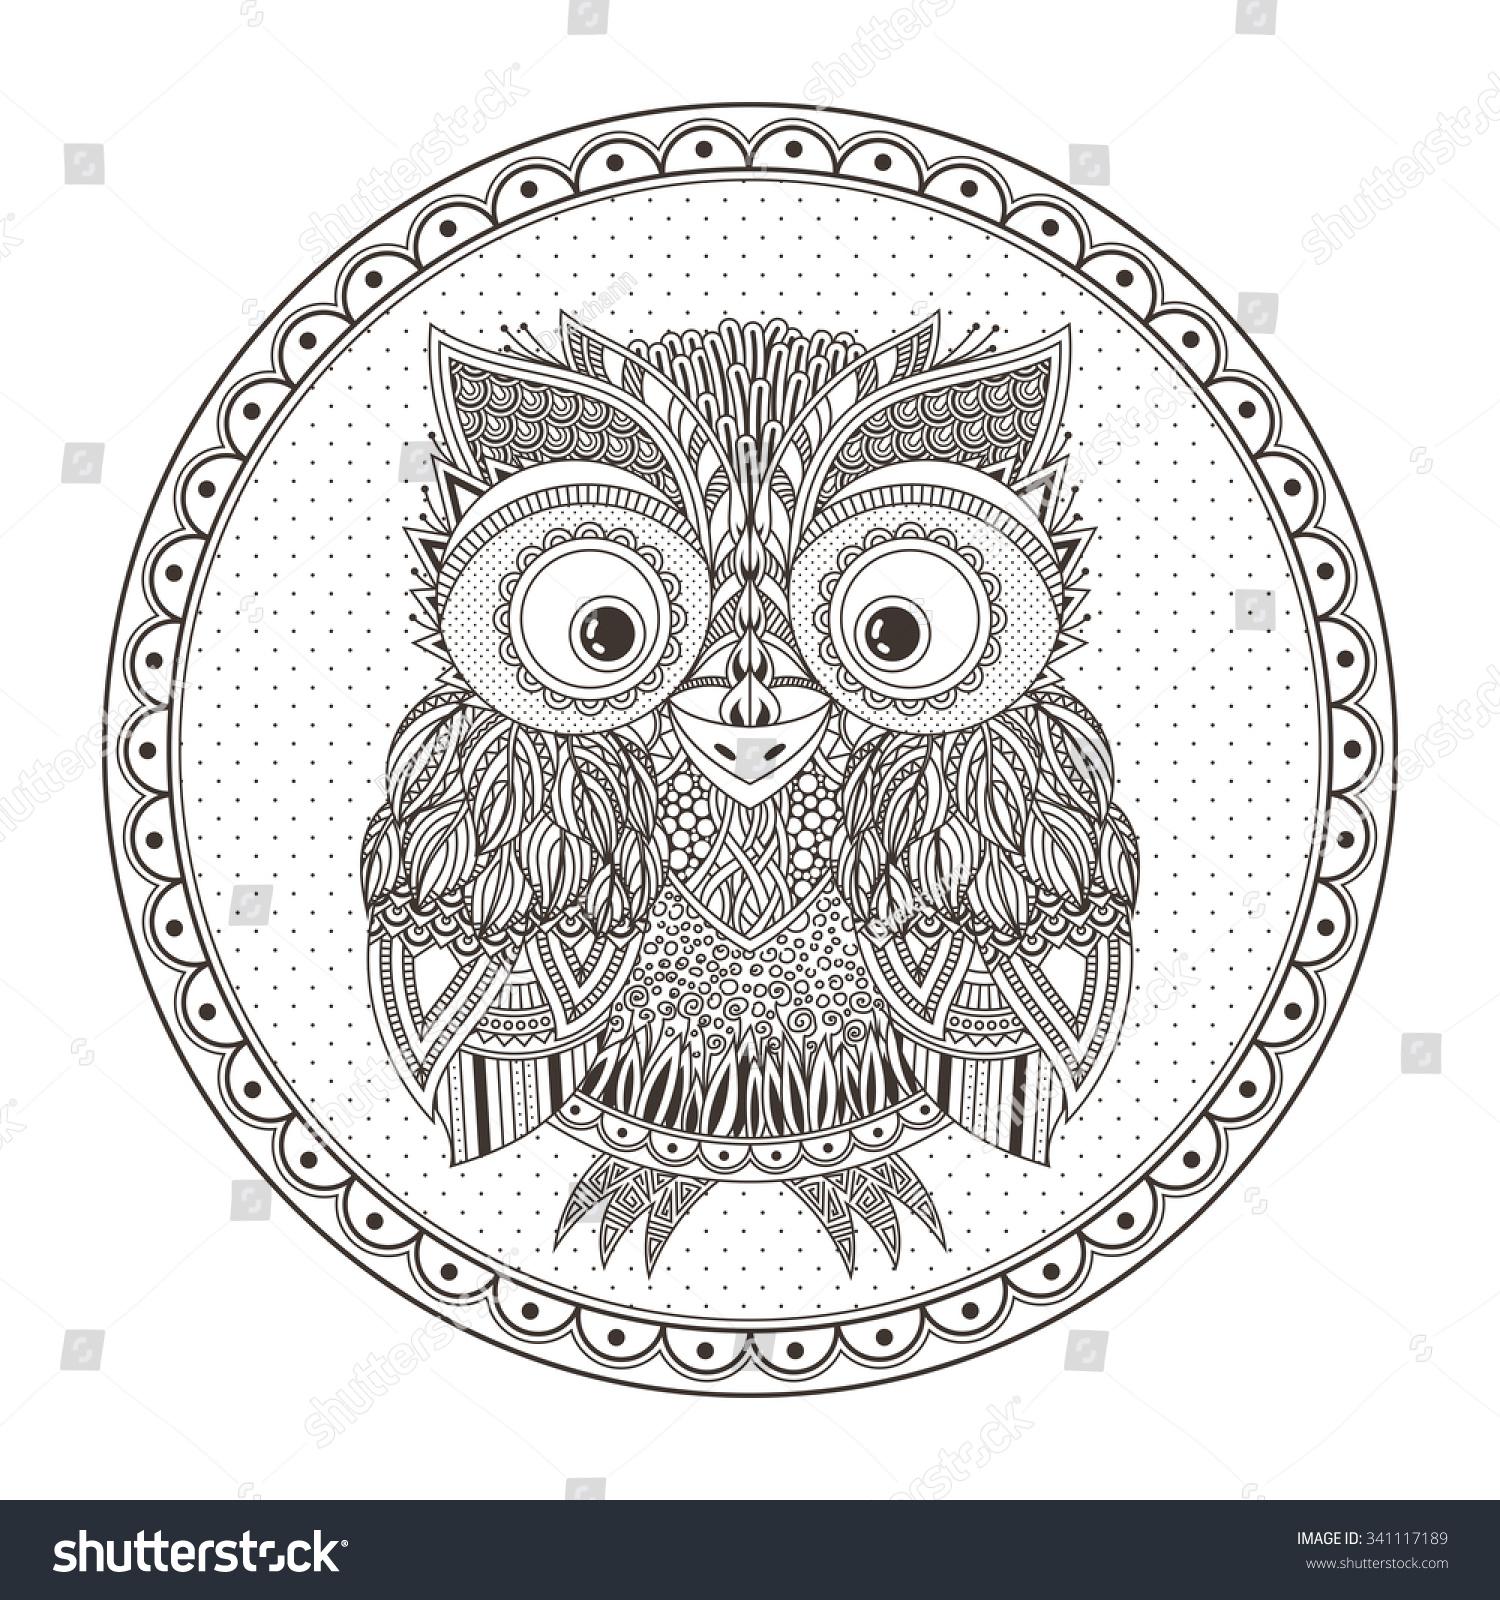 zentangle owl illustration ornate patterned bird stock